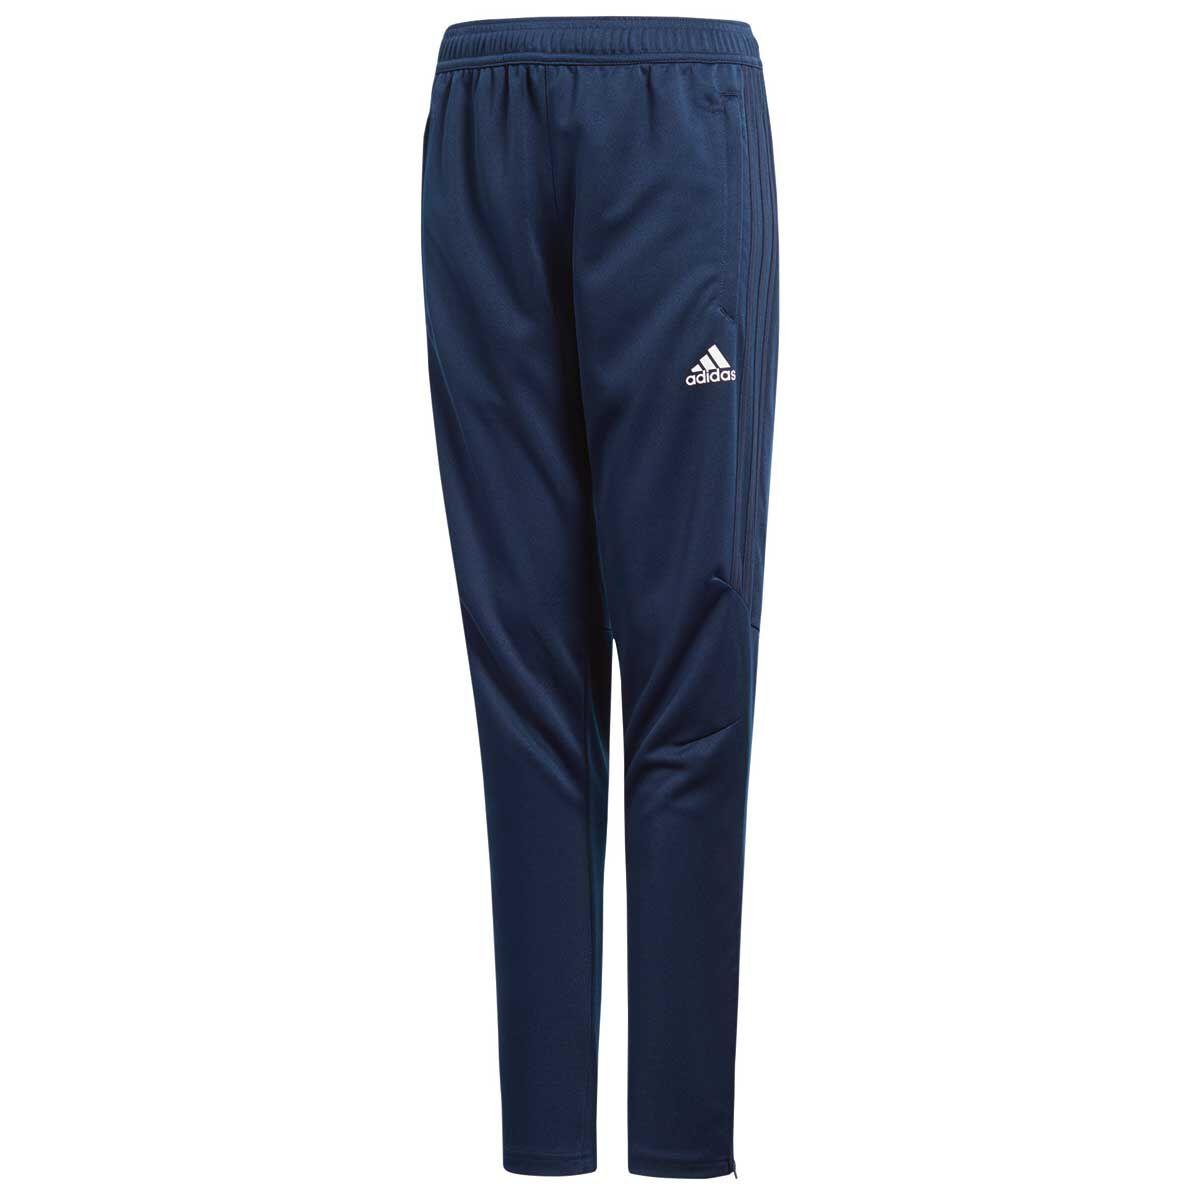 Adidas Tiro 17 Mens Teamwear Rain Jacket Navy